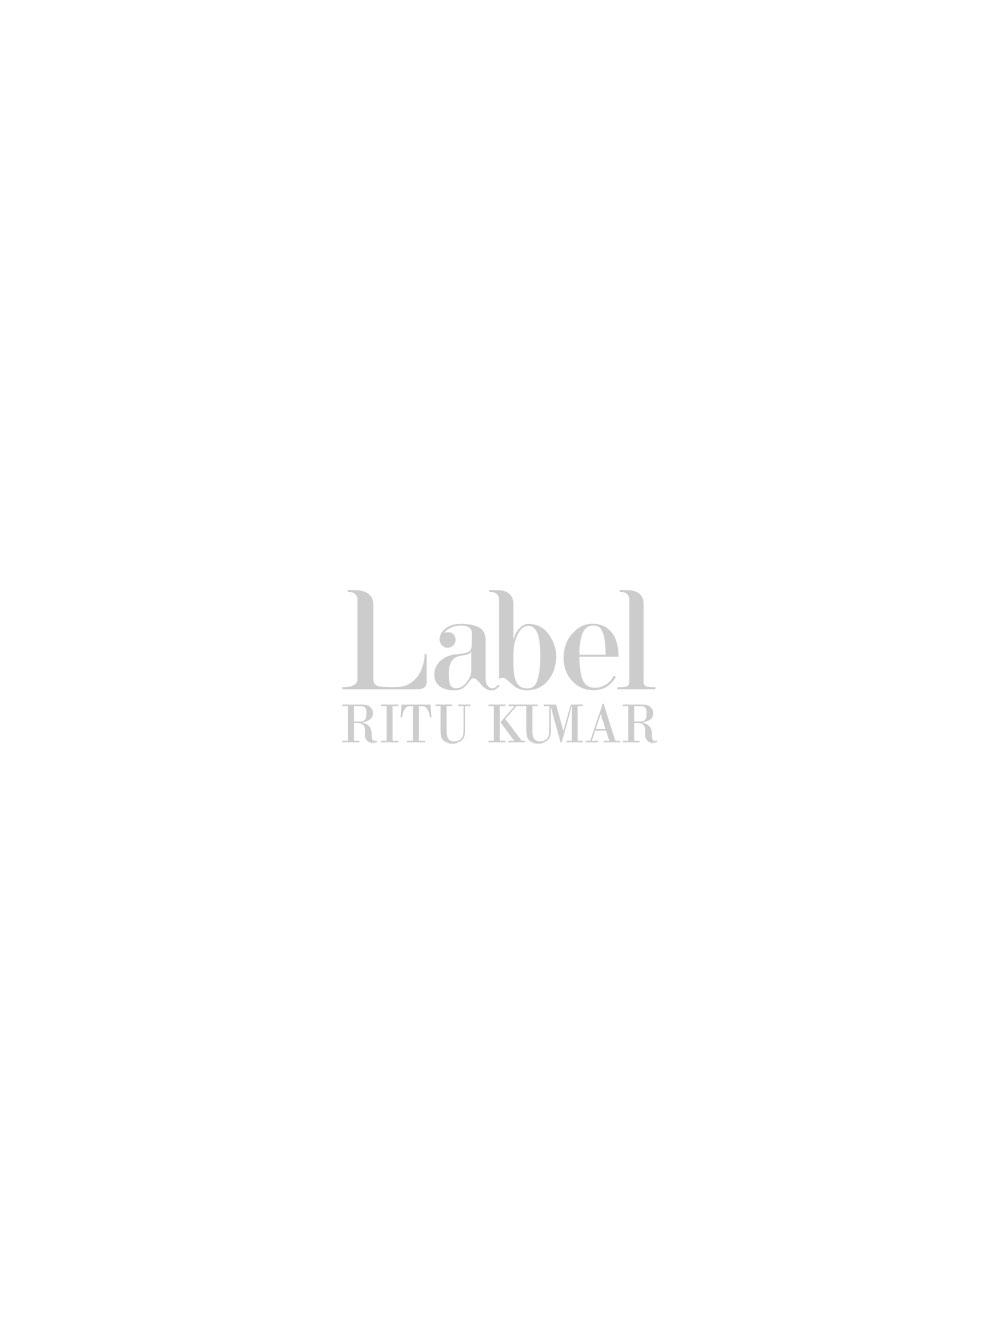 Khaki High Waisted Culottes By Label Ritu kumar